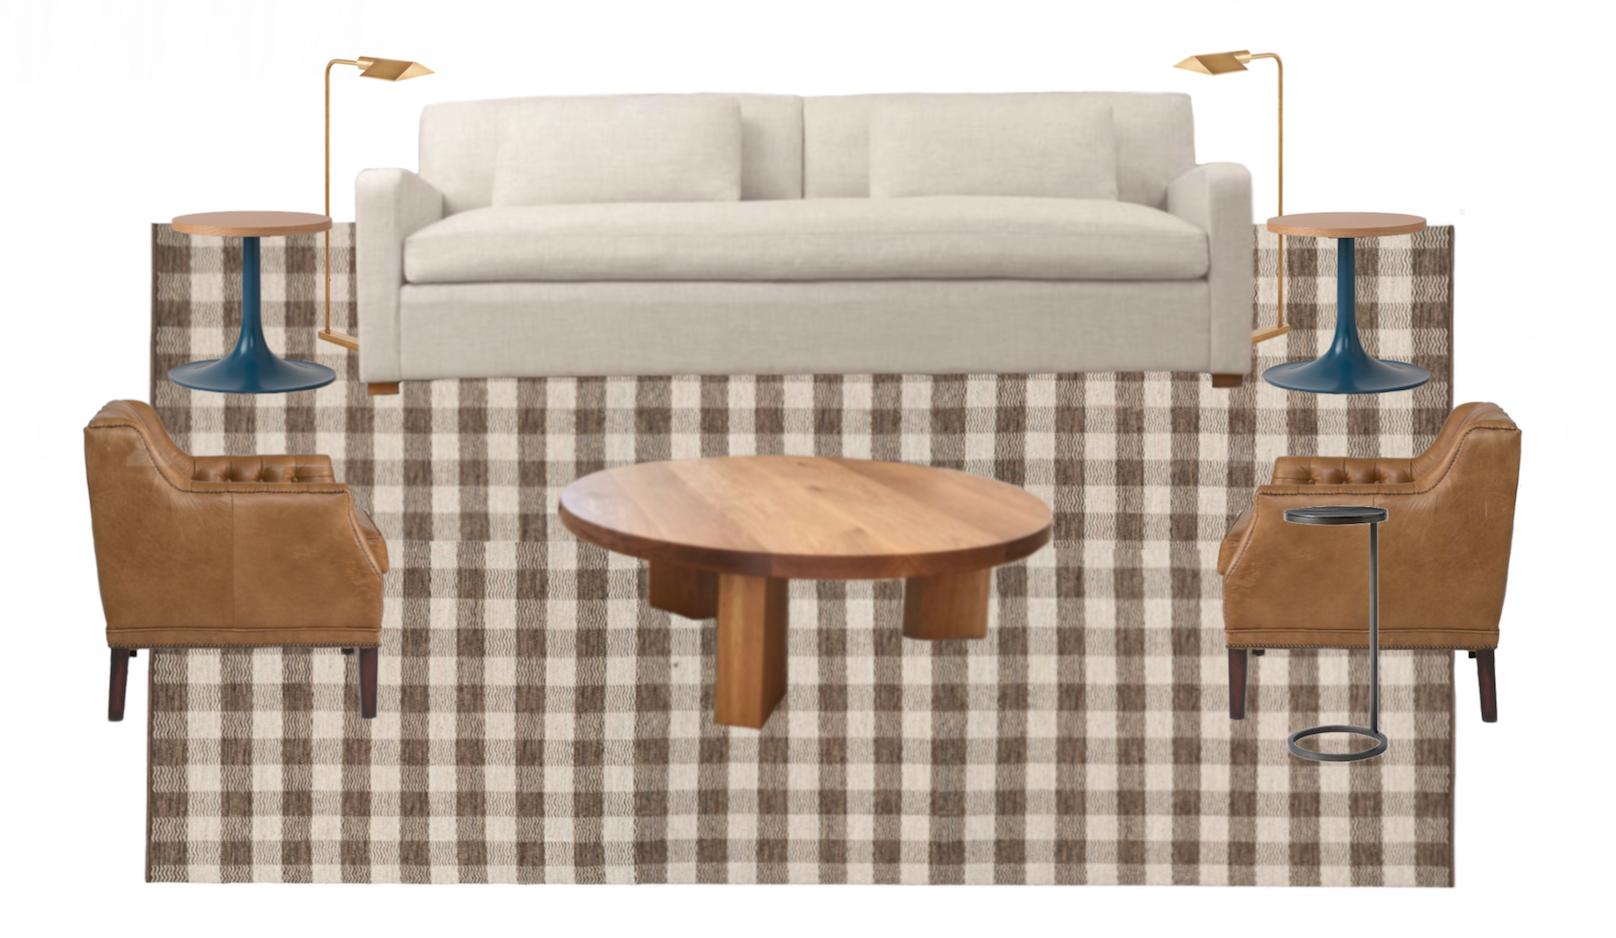 cabin furniture scheme